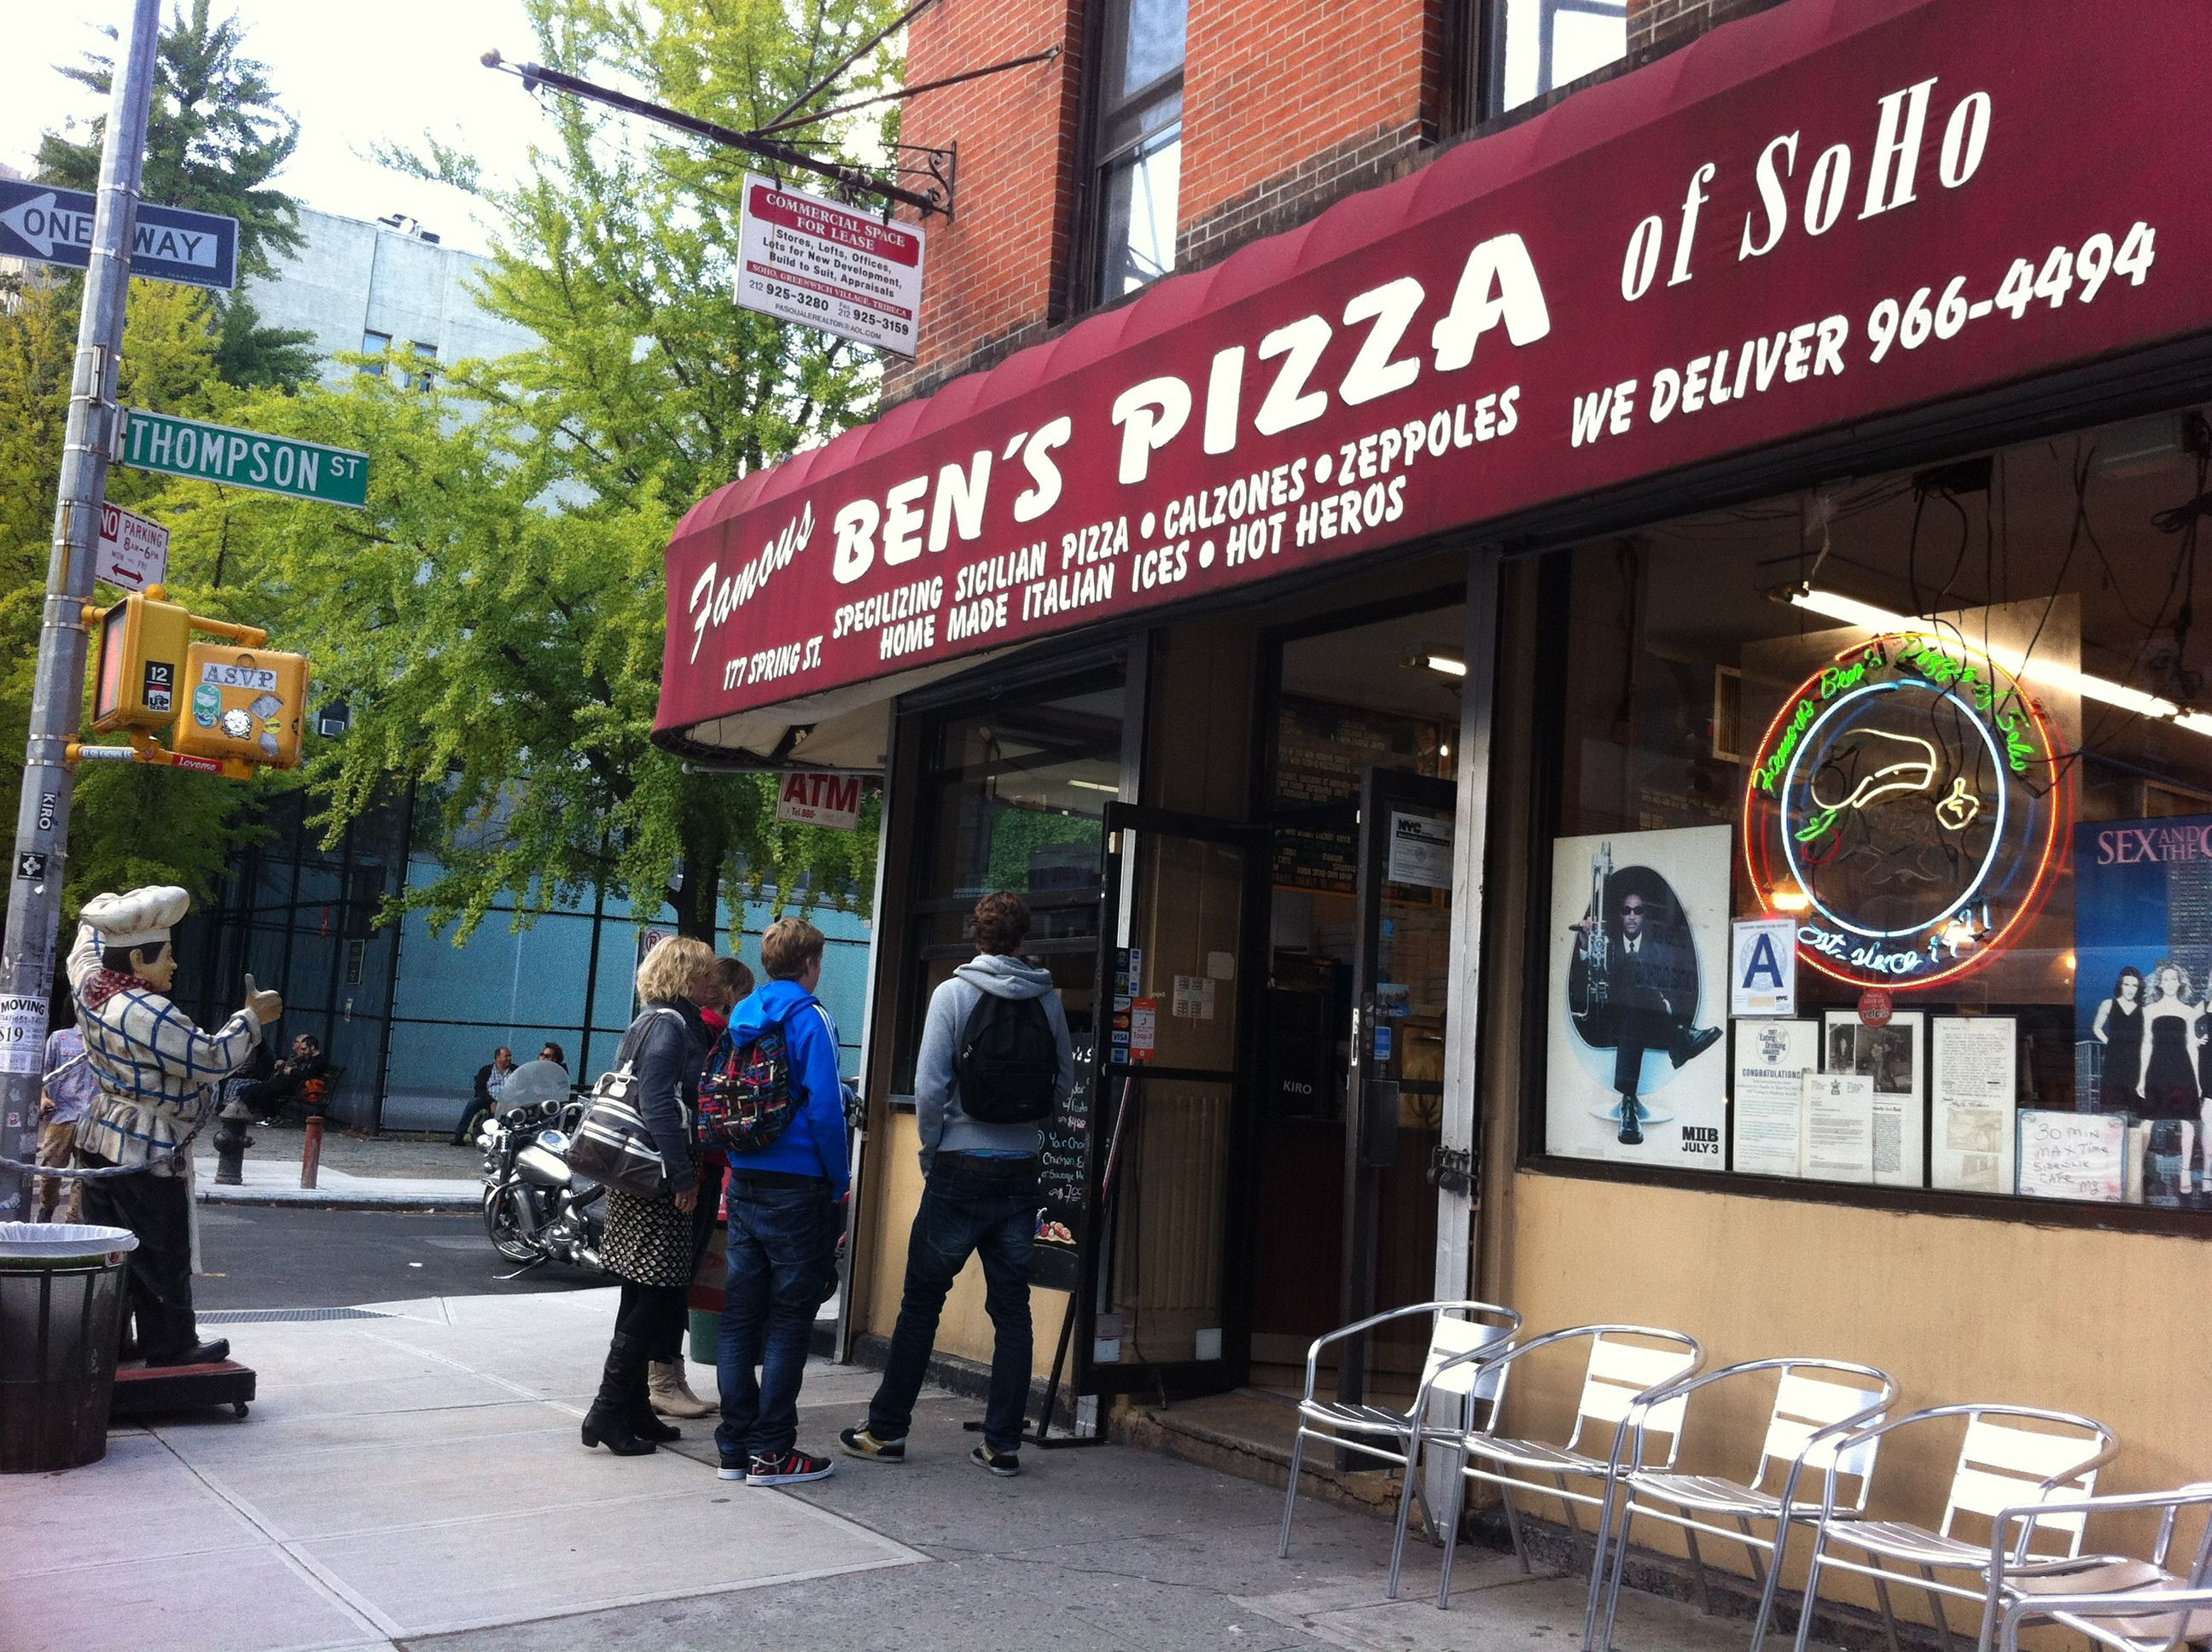 Ben S Pizza Soho New York City Us Soho Nyc Trip Restaurant New York